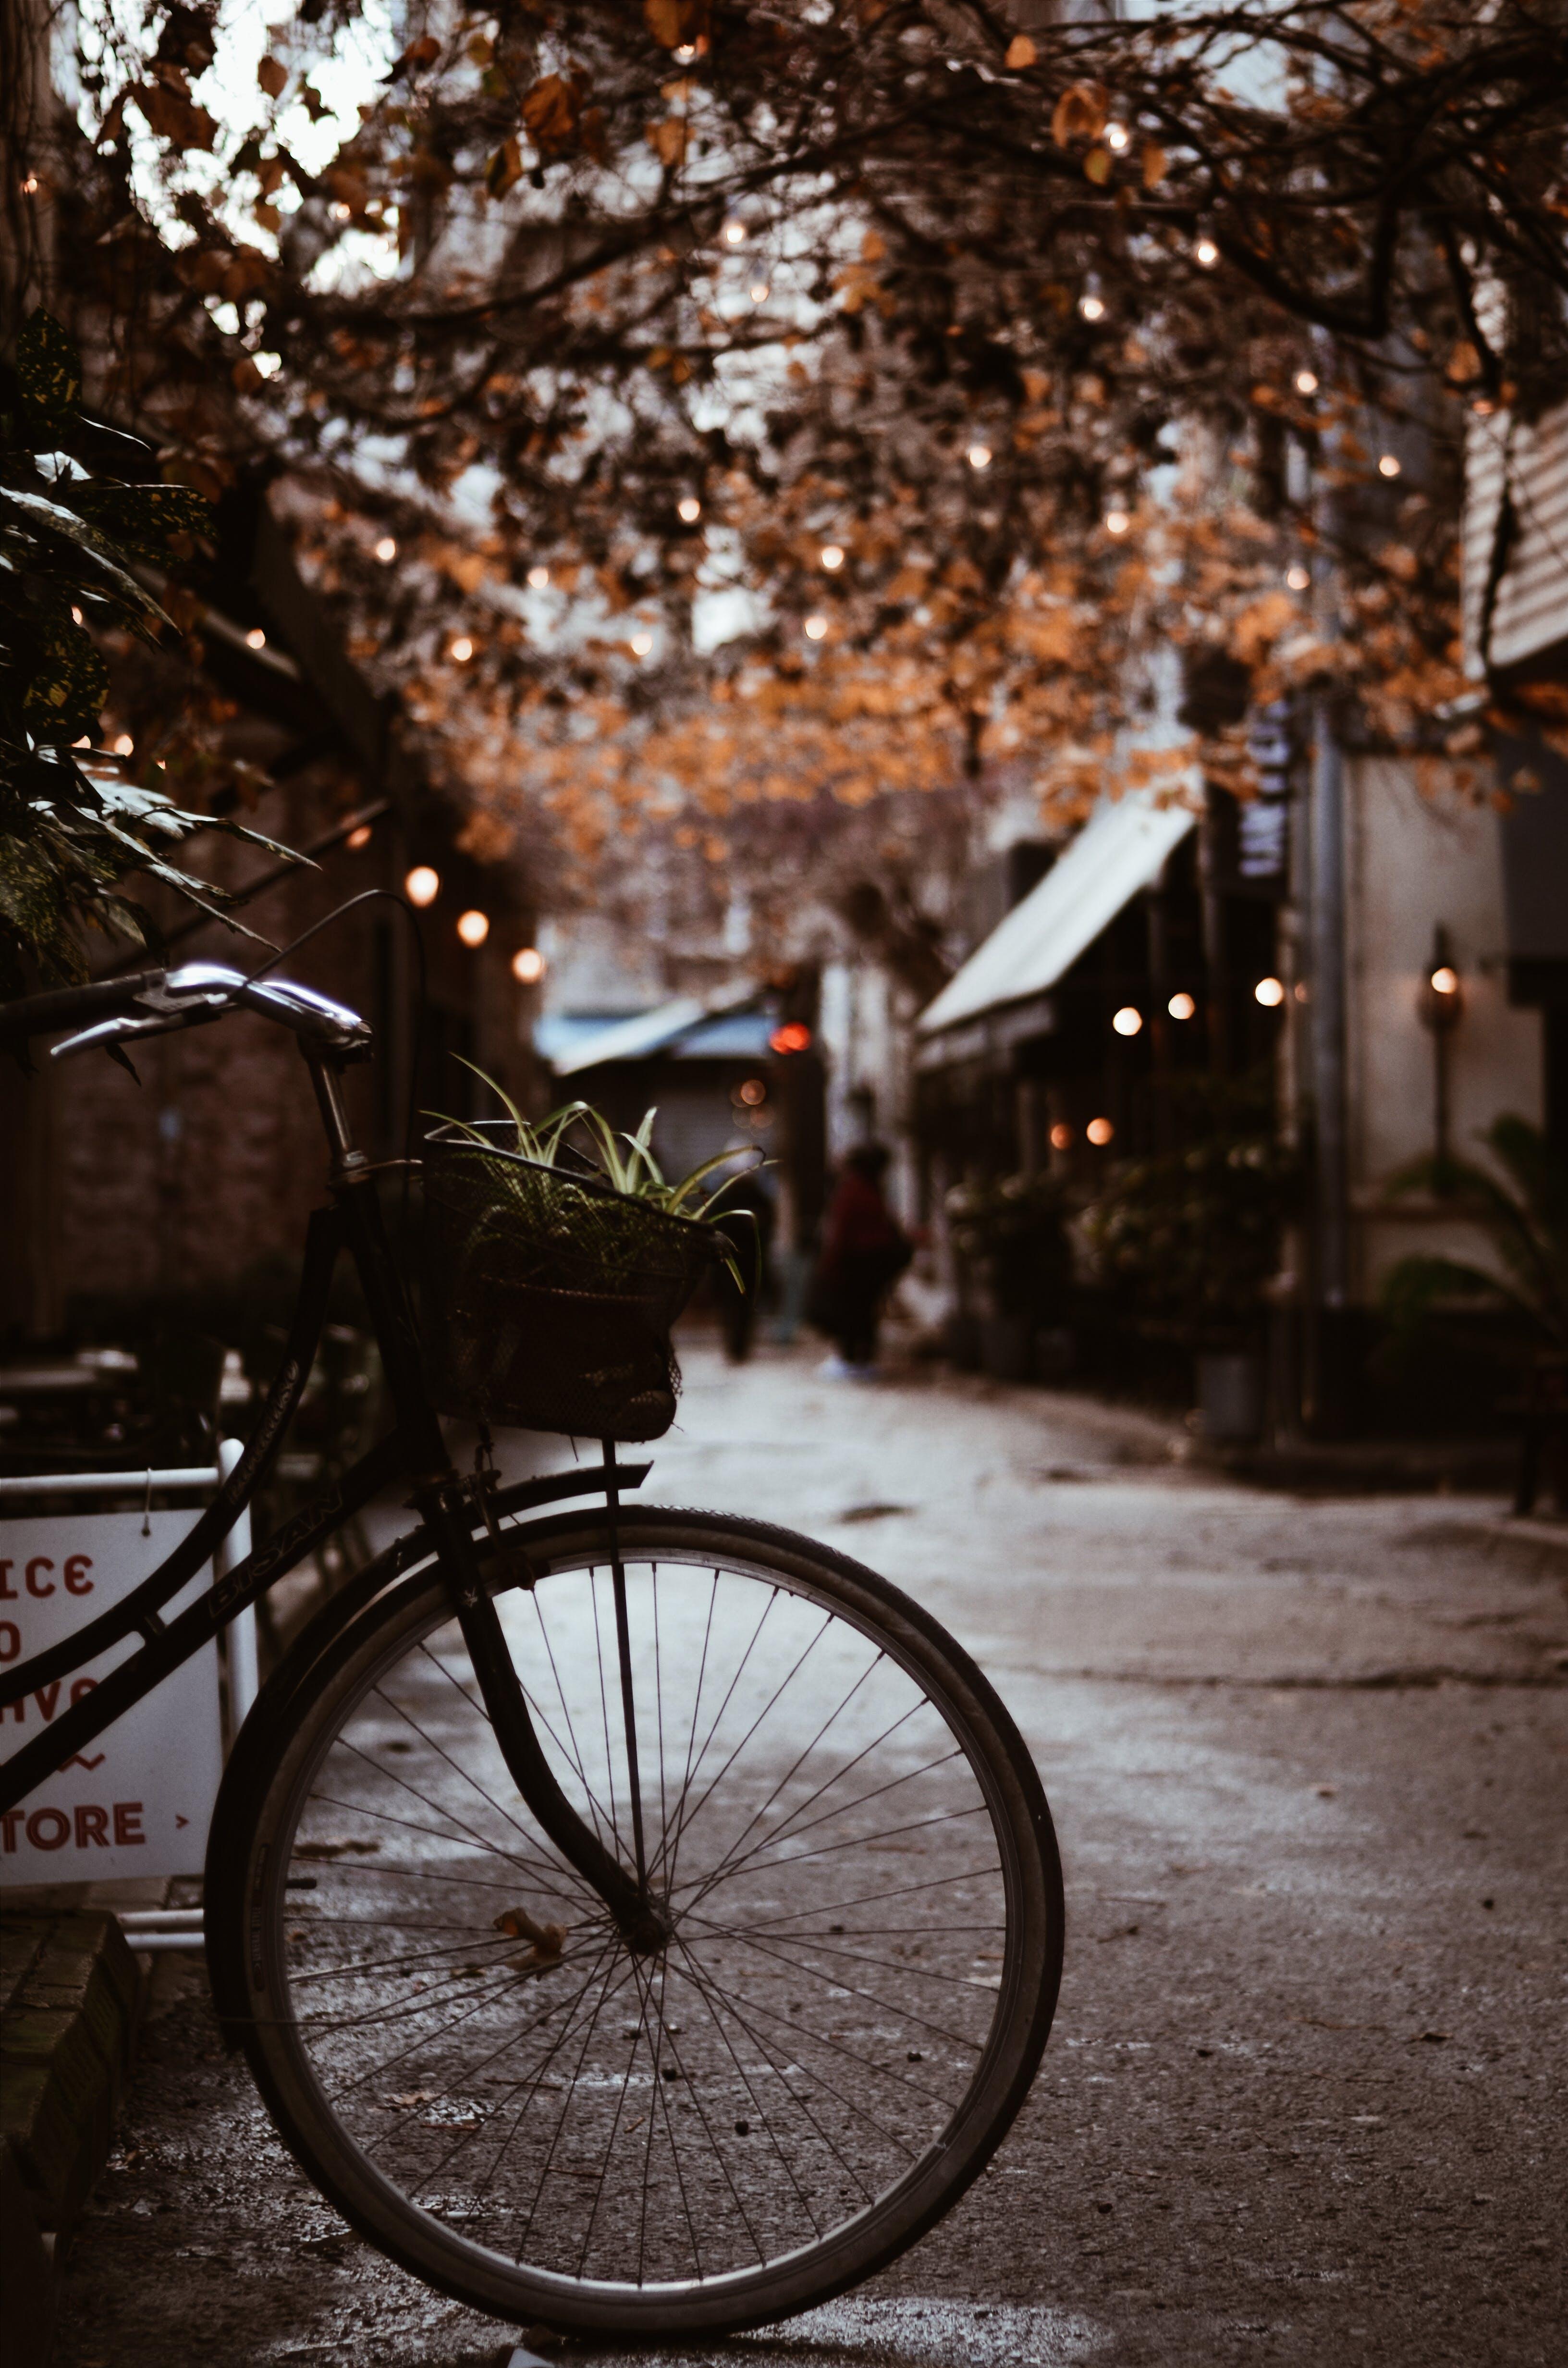 Bike With Basket Parked Near Tree